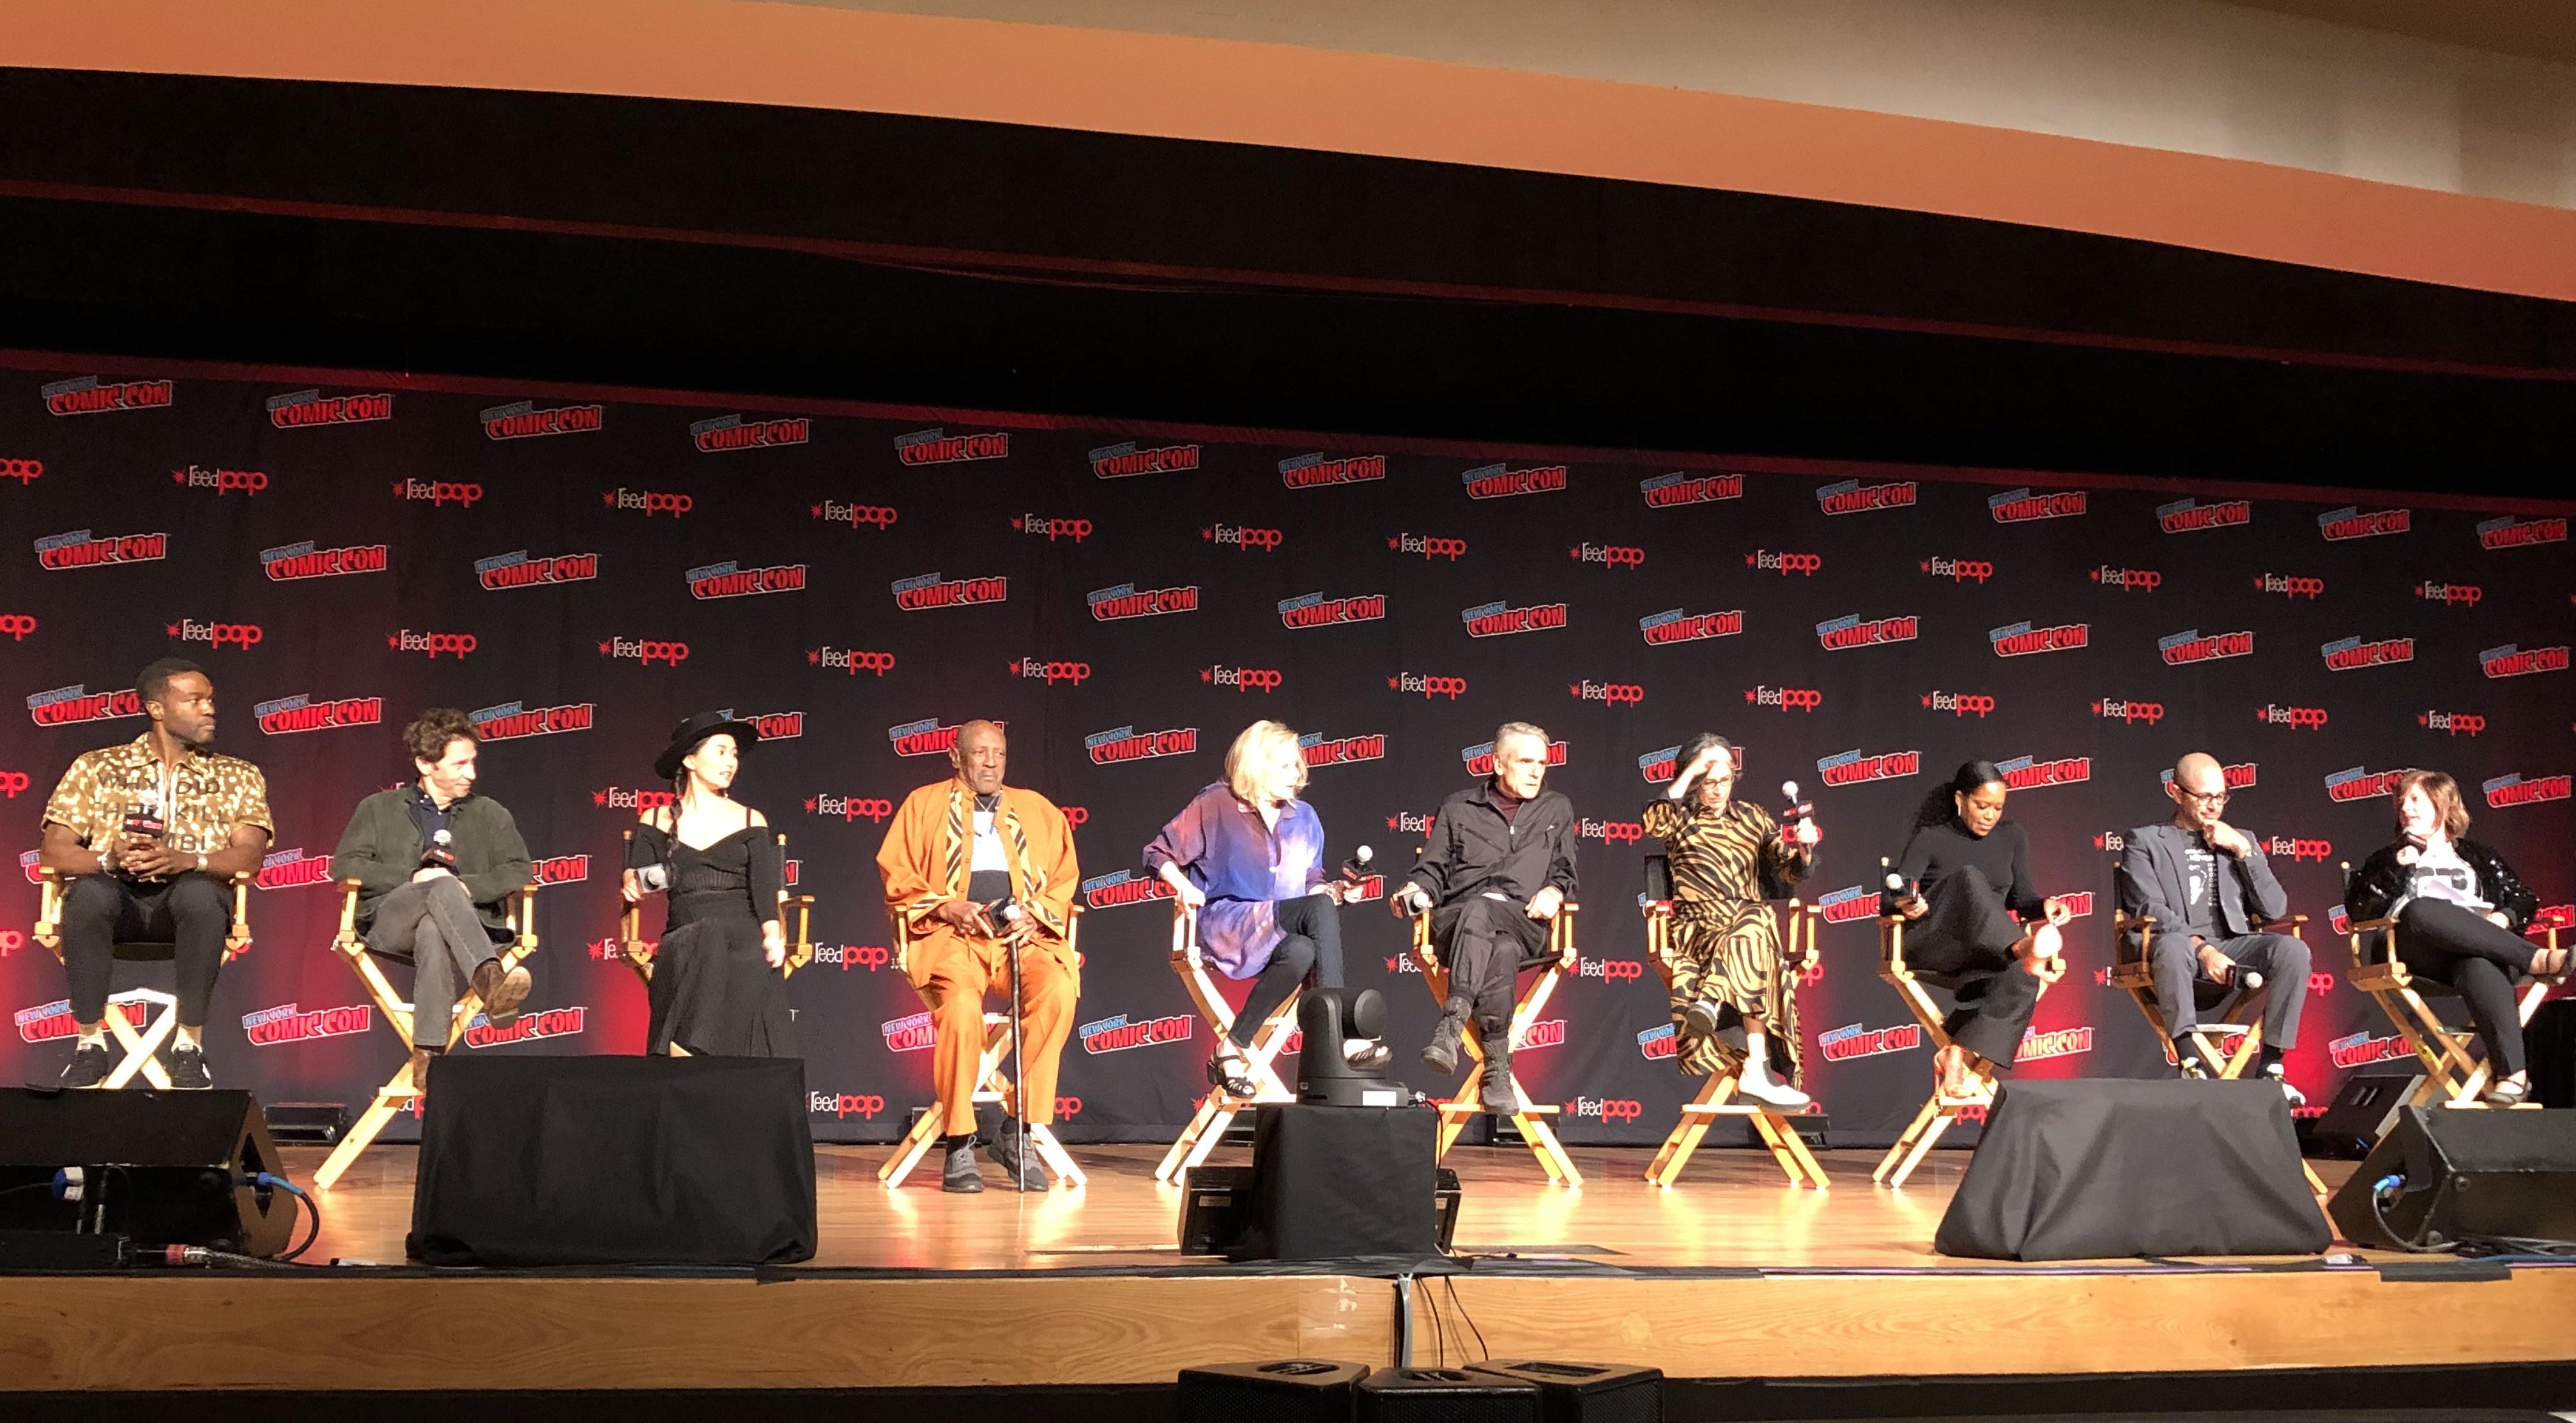 Watchmen panel